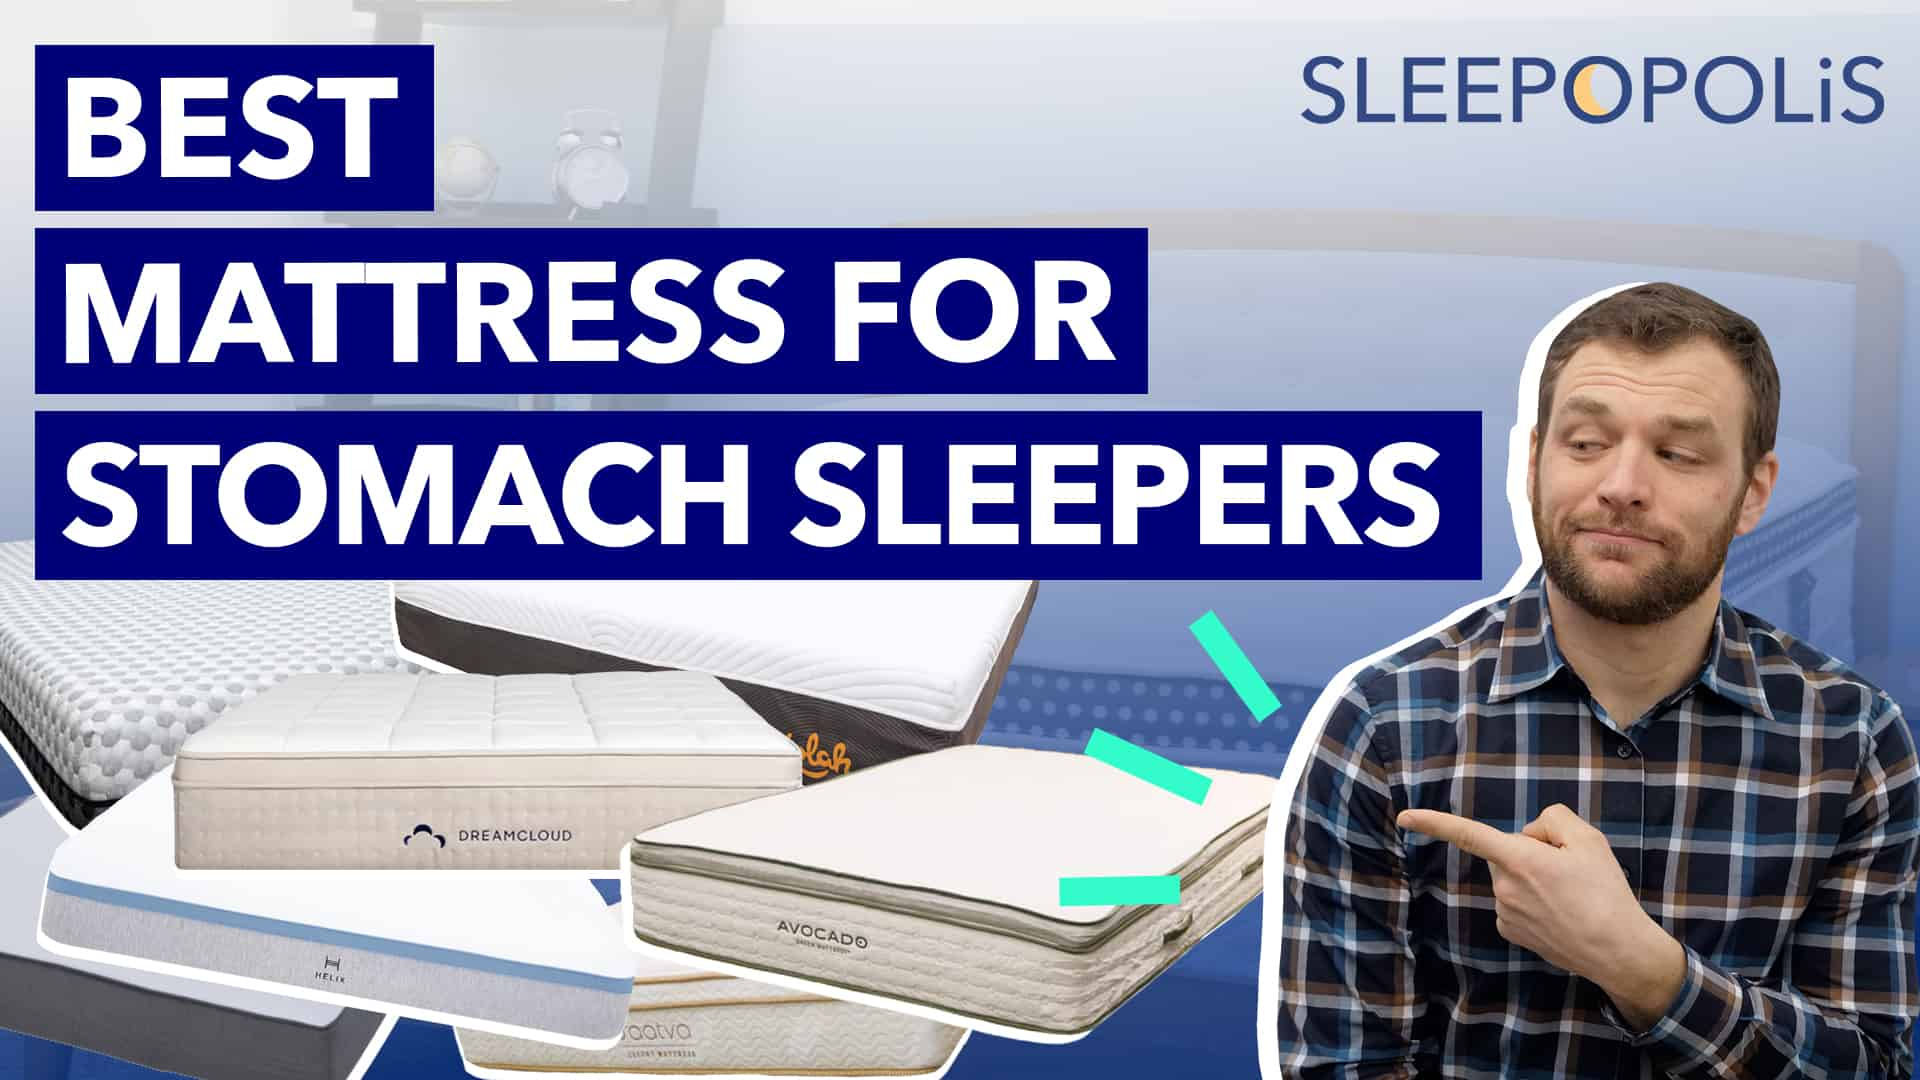 Best Mattress For Stomach Sleepers 2020 Sleepopolis